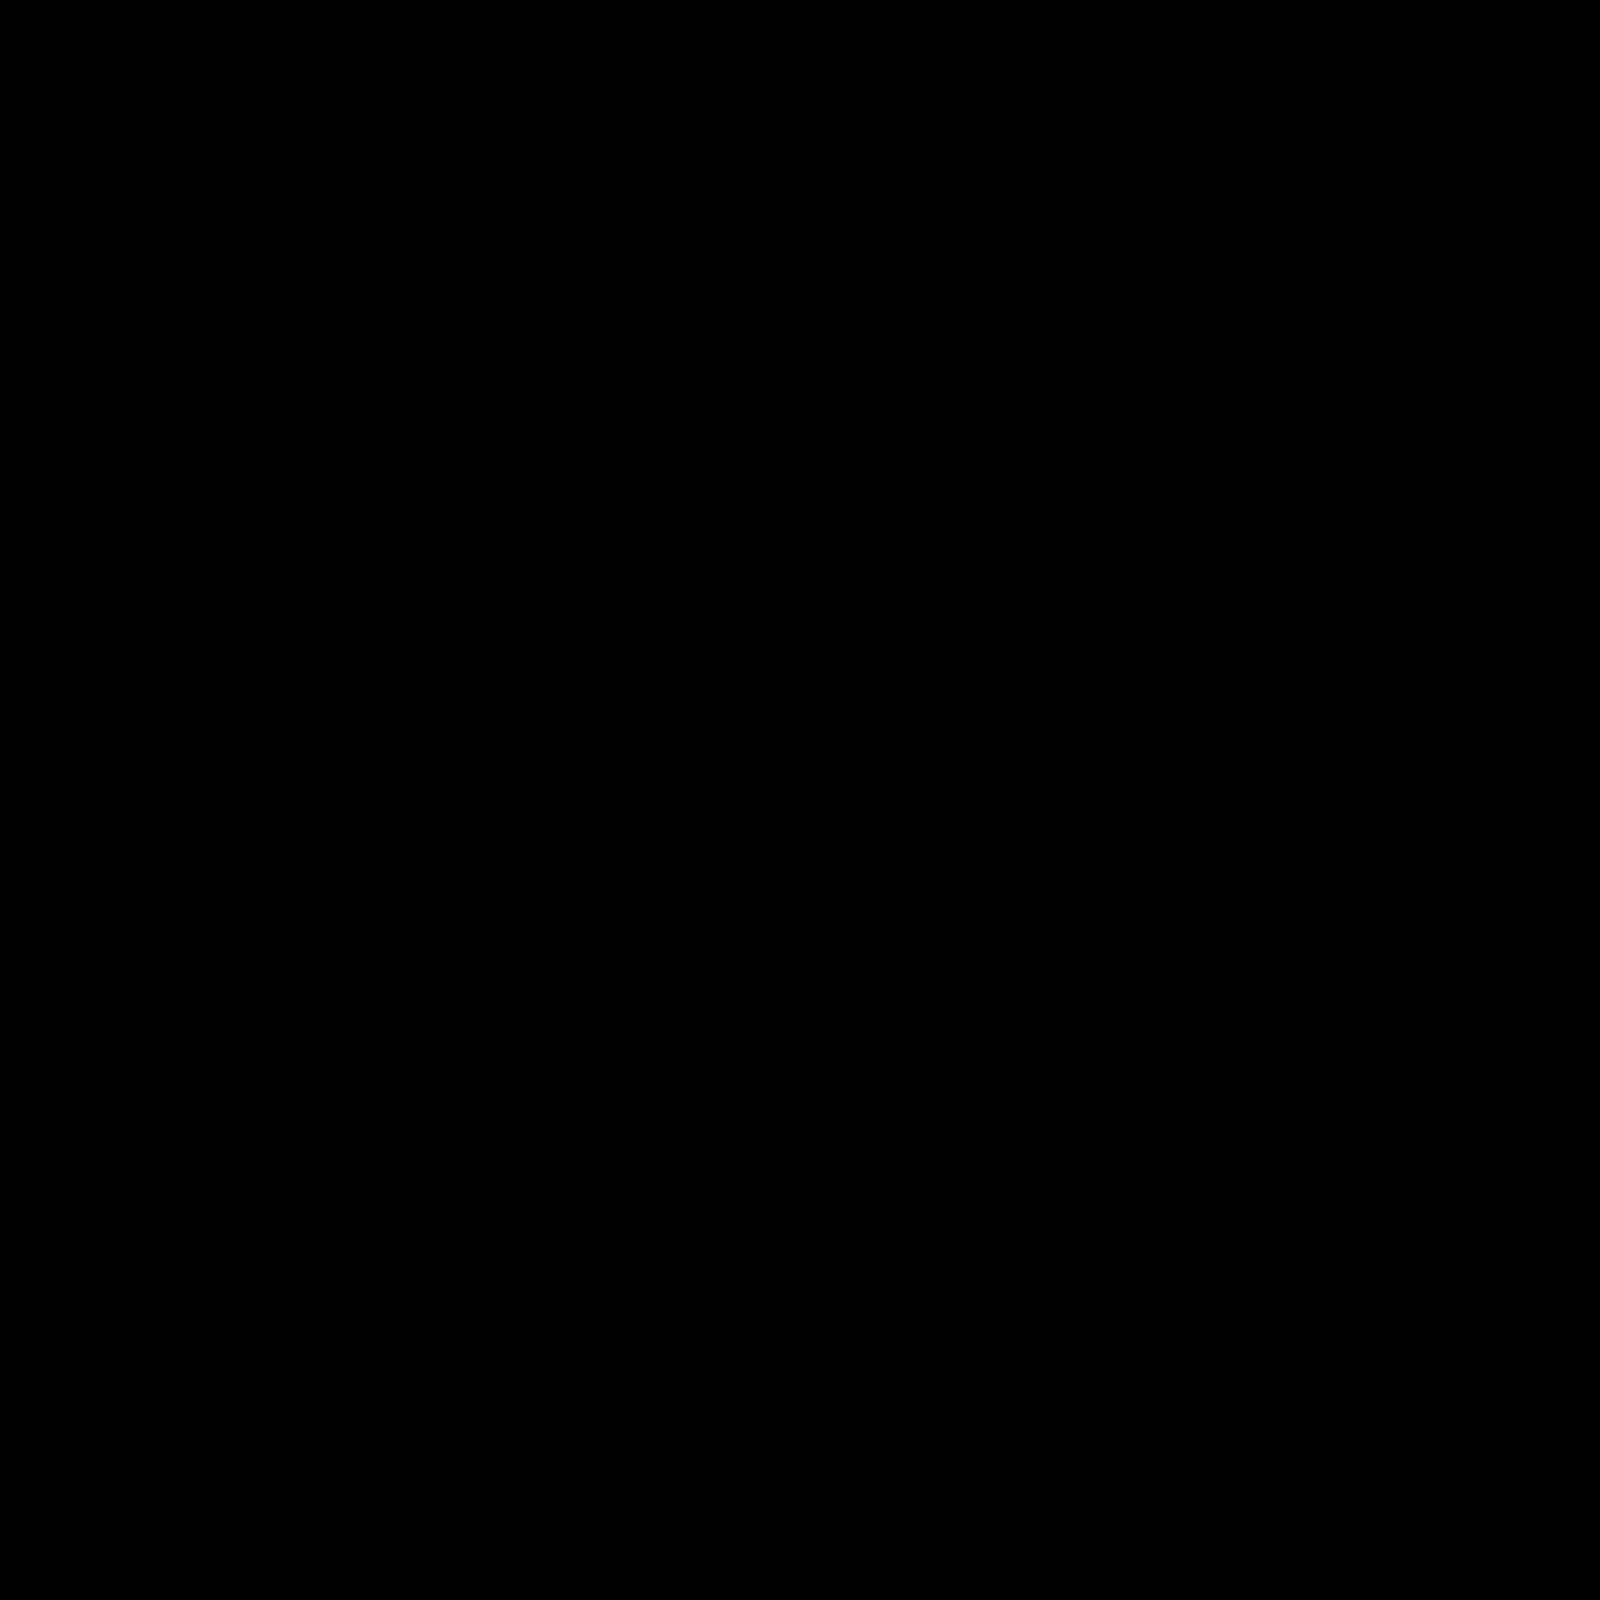 Grados icon